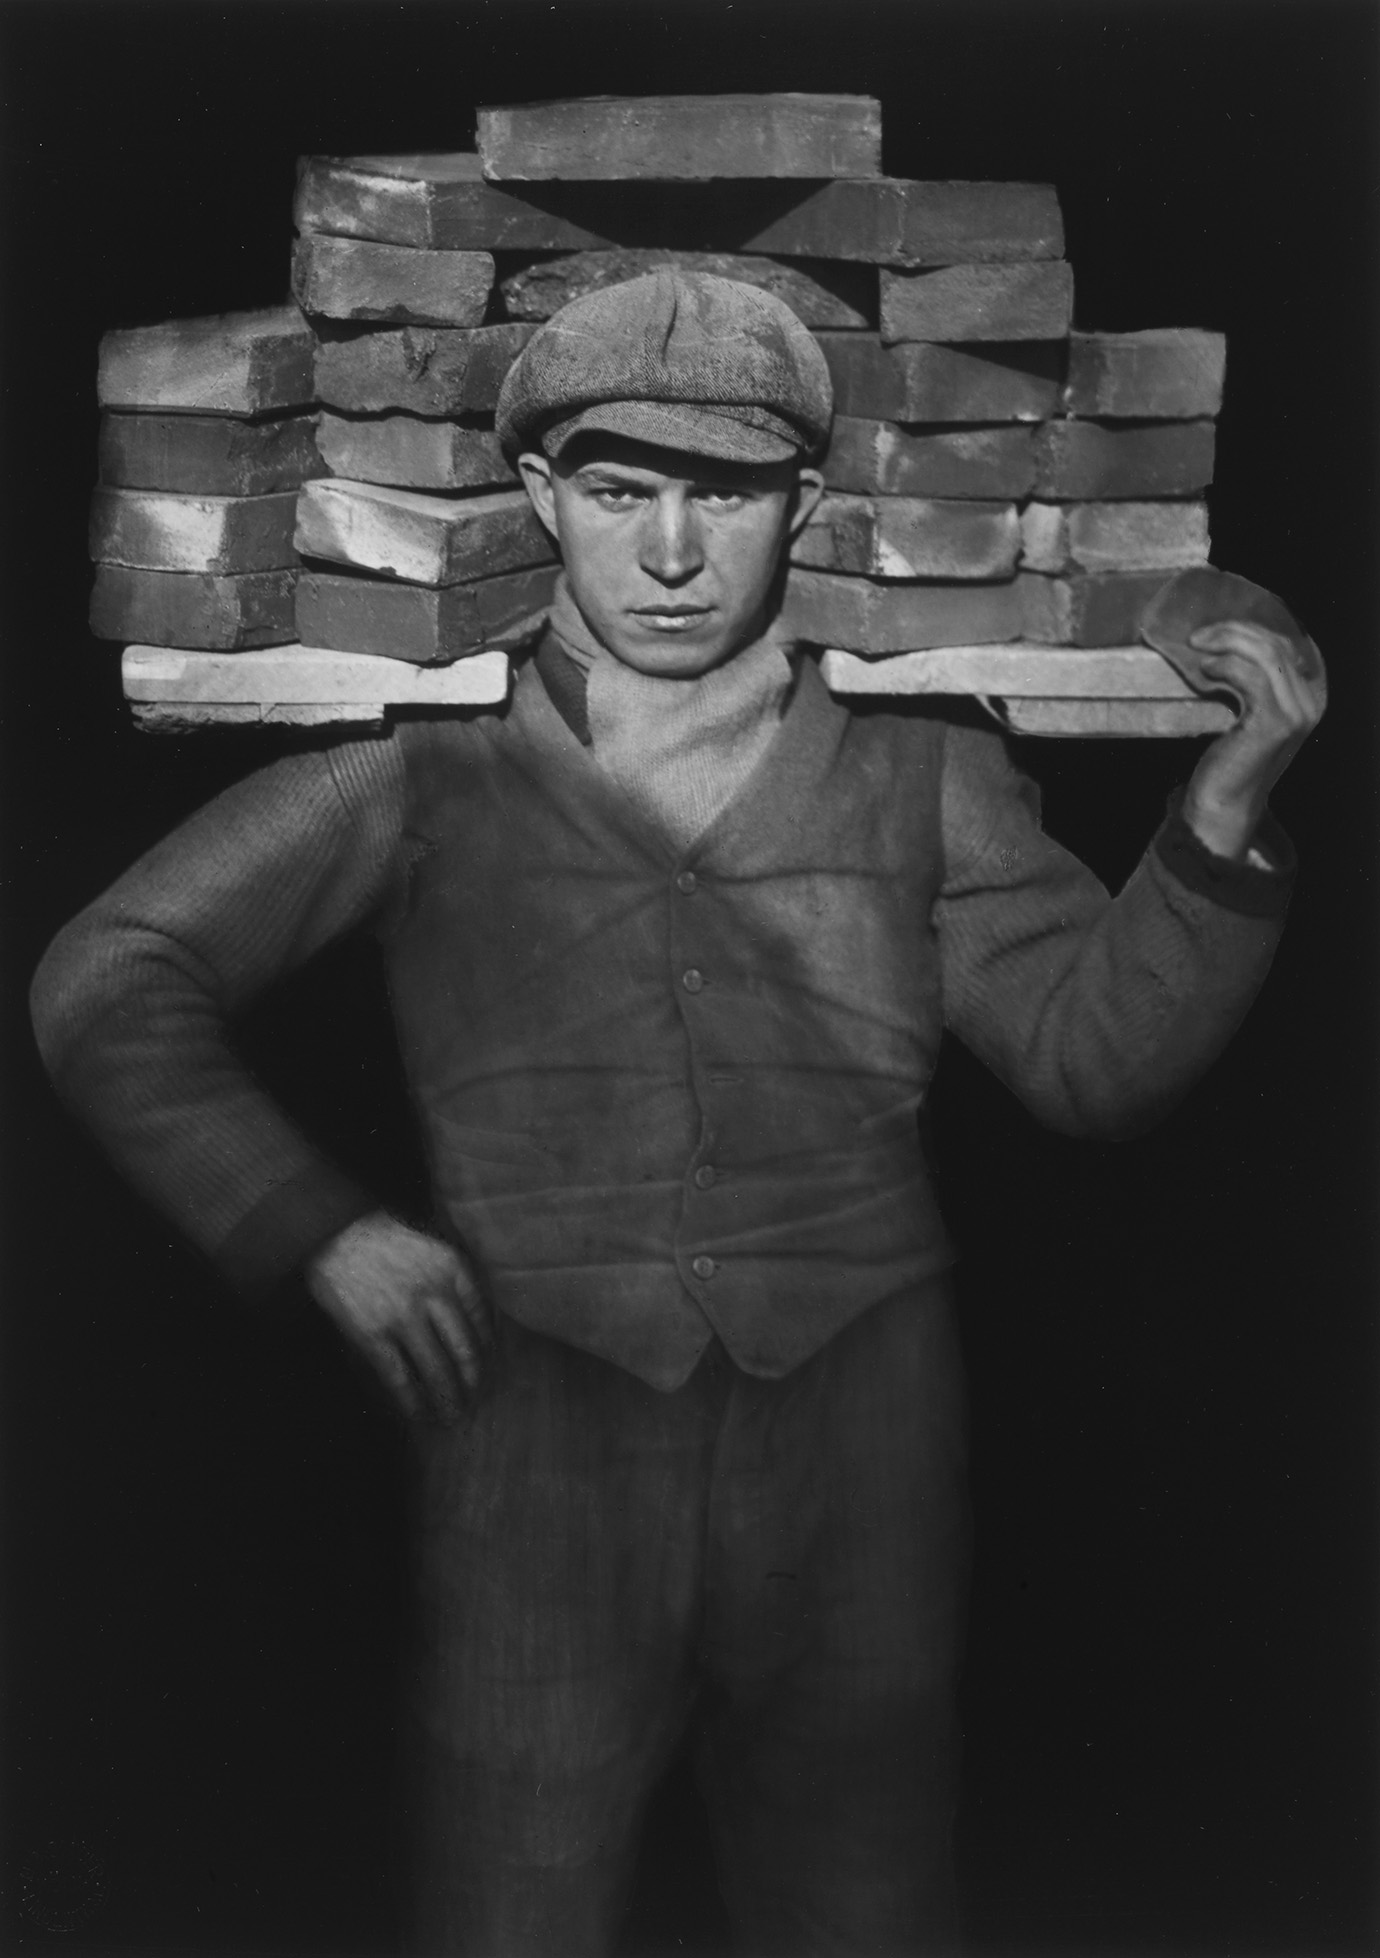 August Sander, Handlanger, 1928